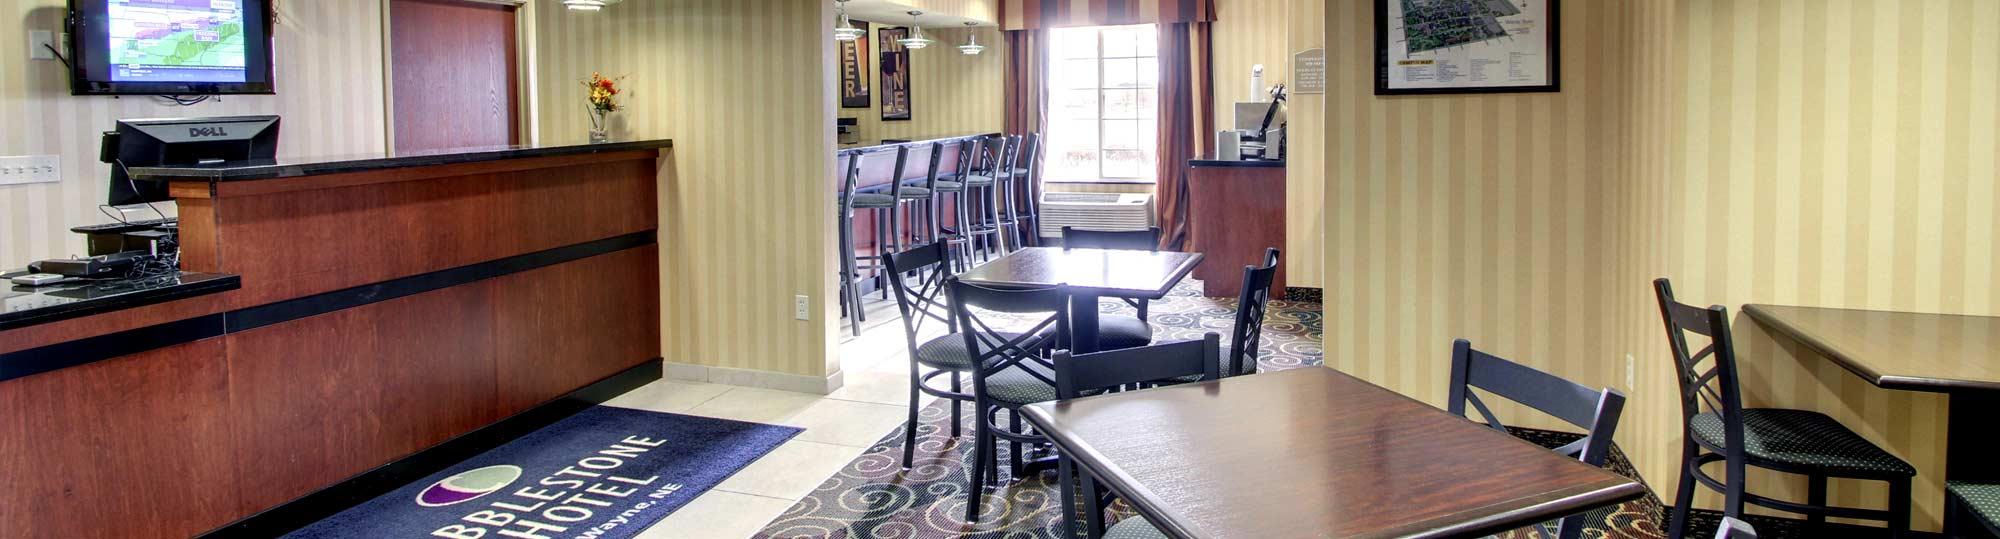 Cobblestone Hotel Wayne